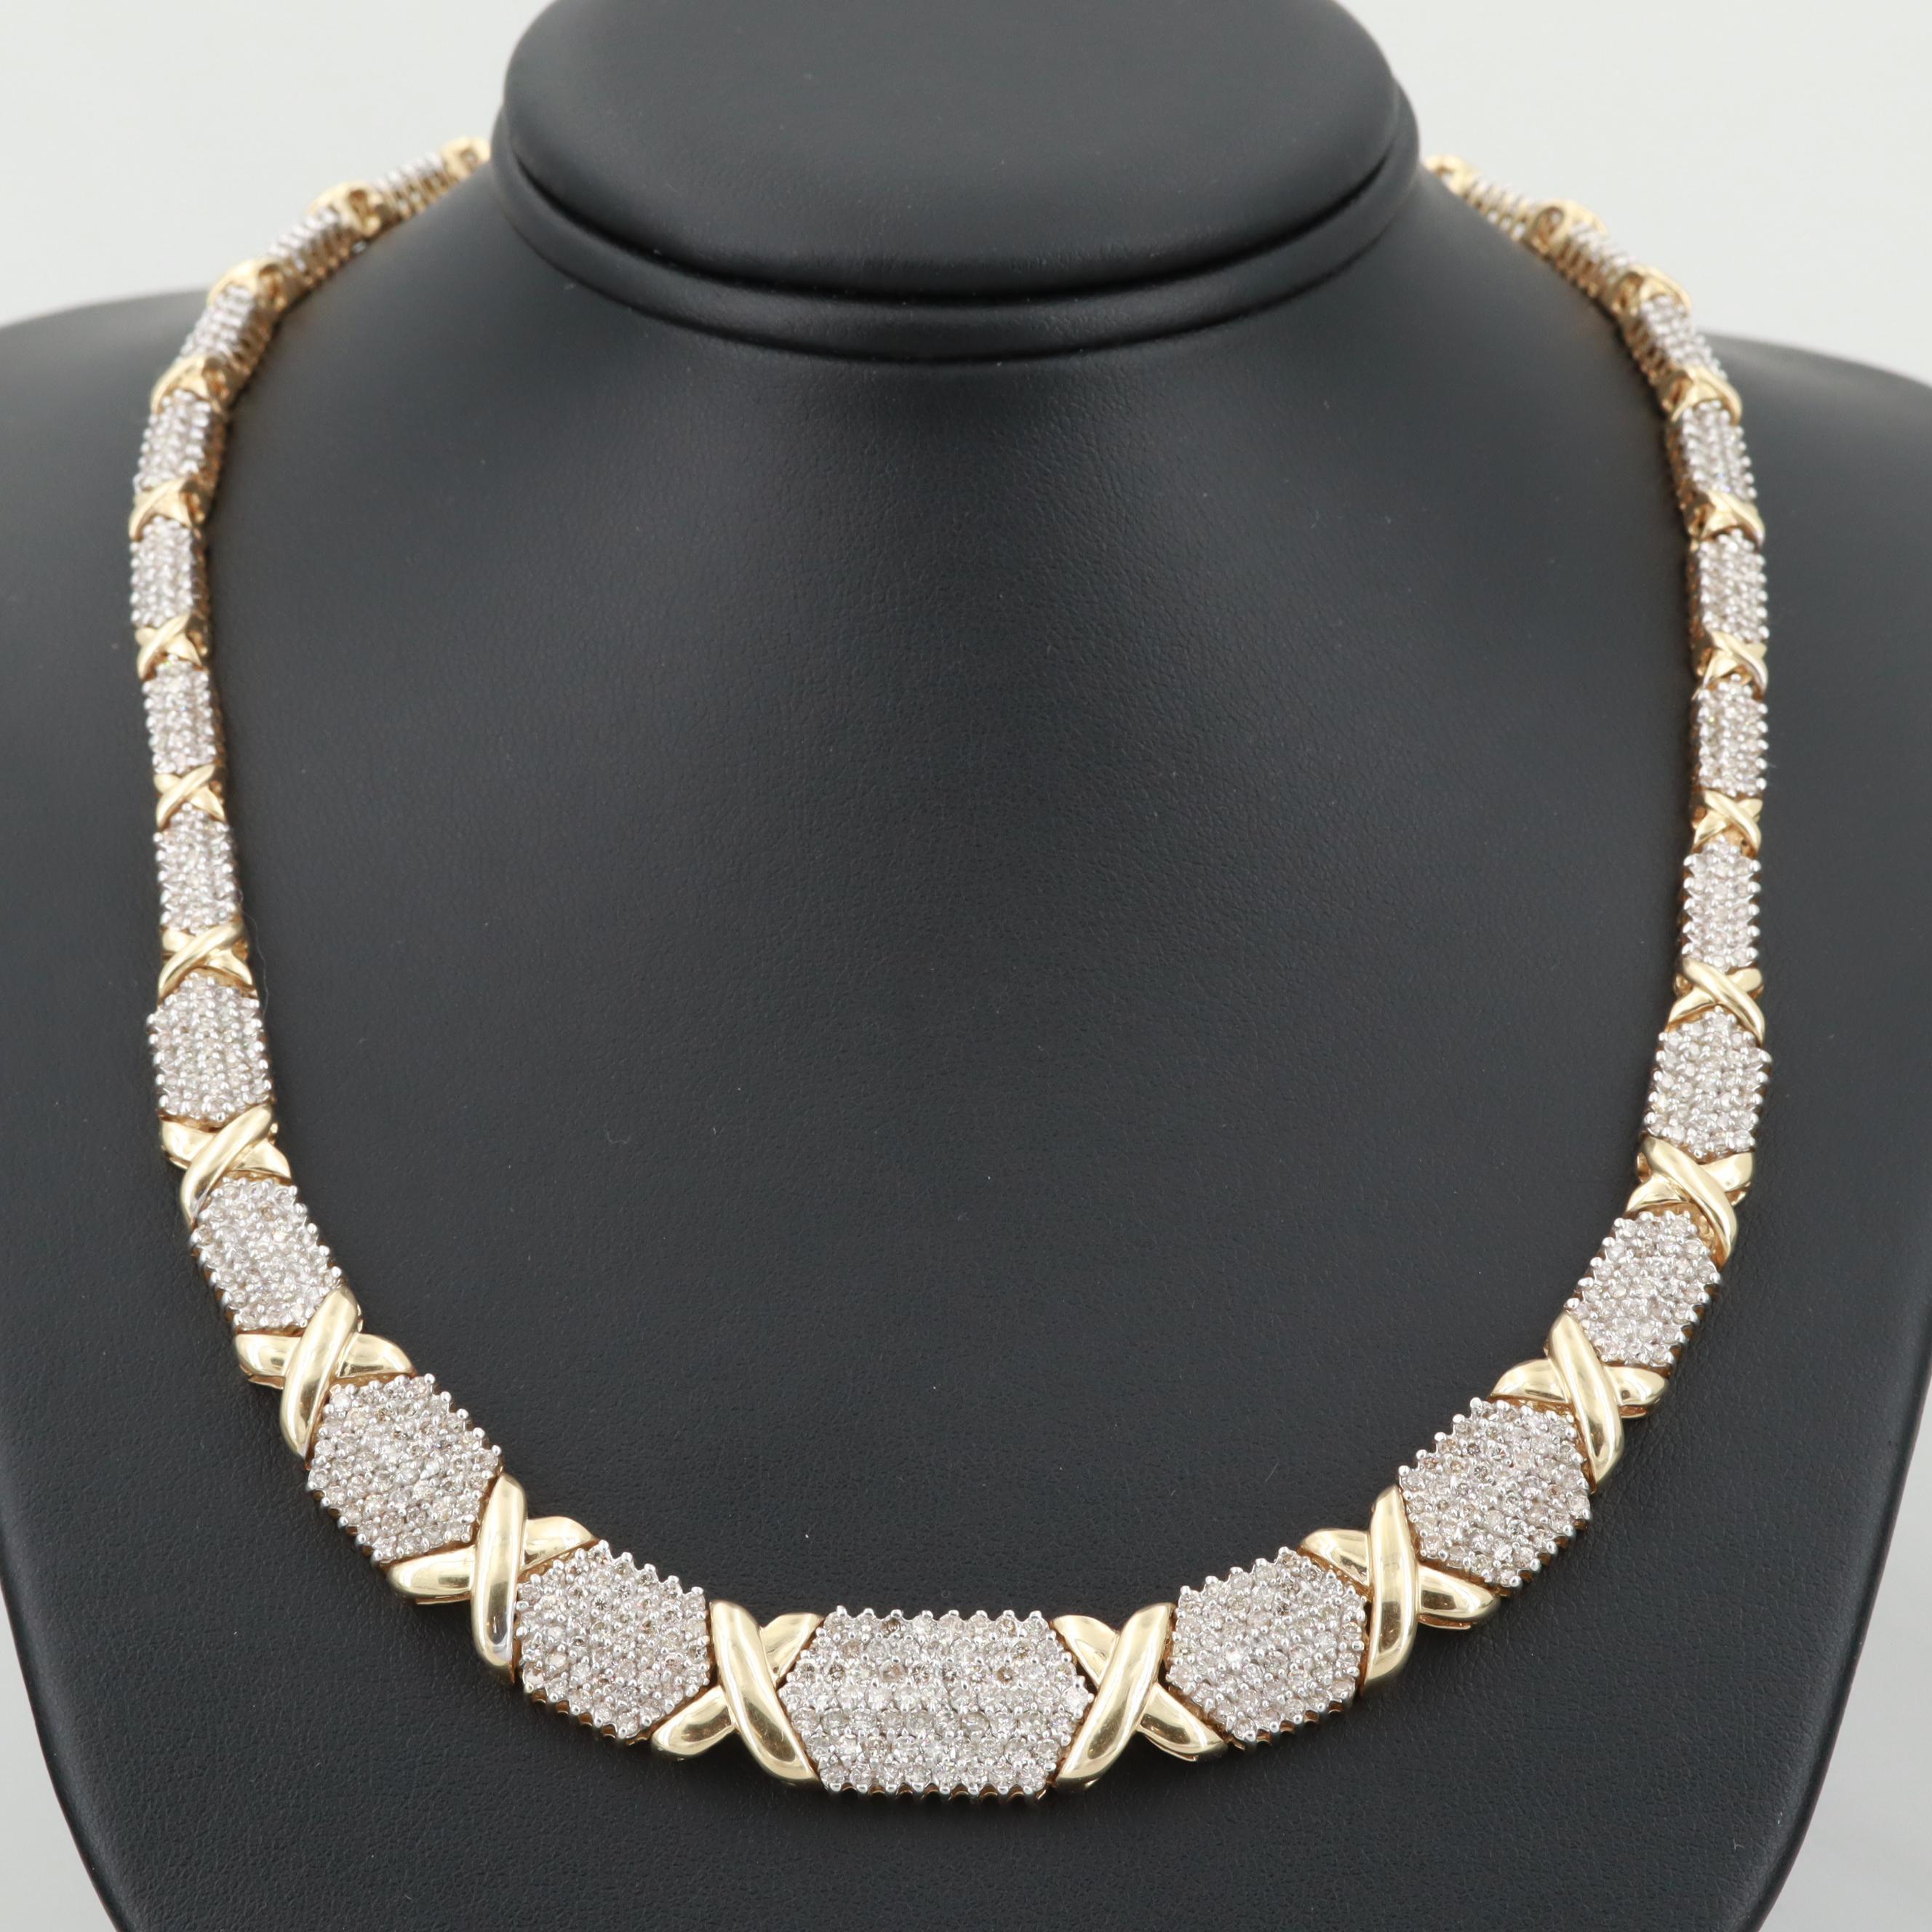 14K Yellow Gold 9.00 CTW Diamond Necklace